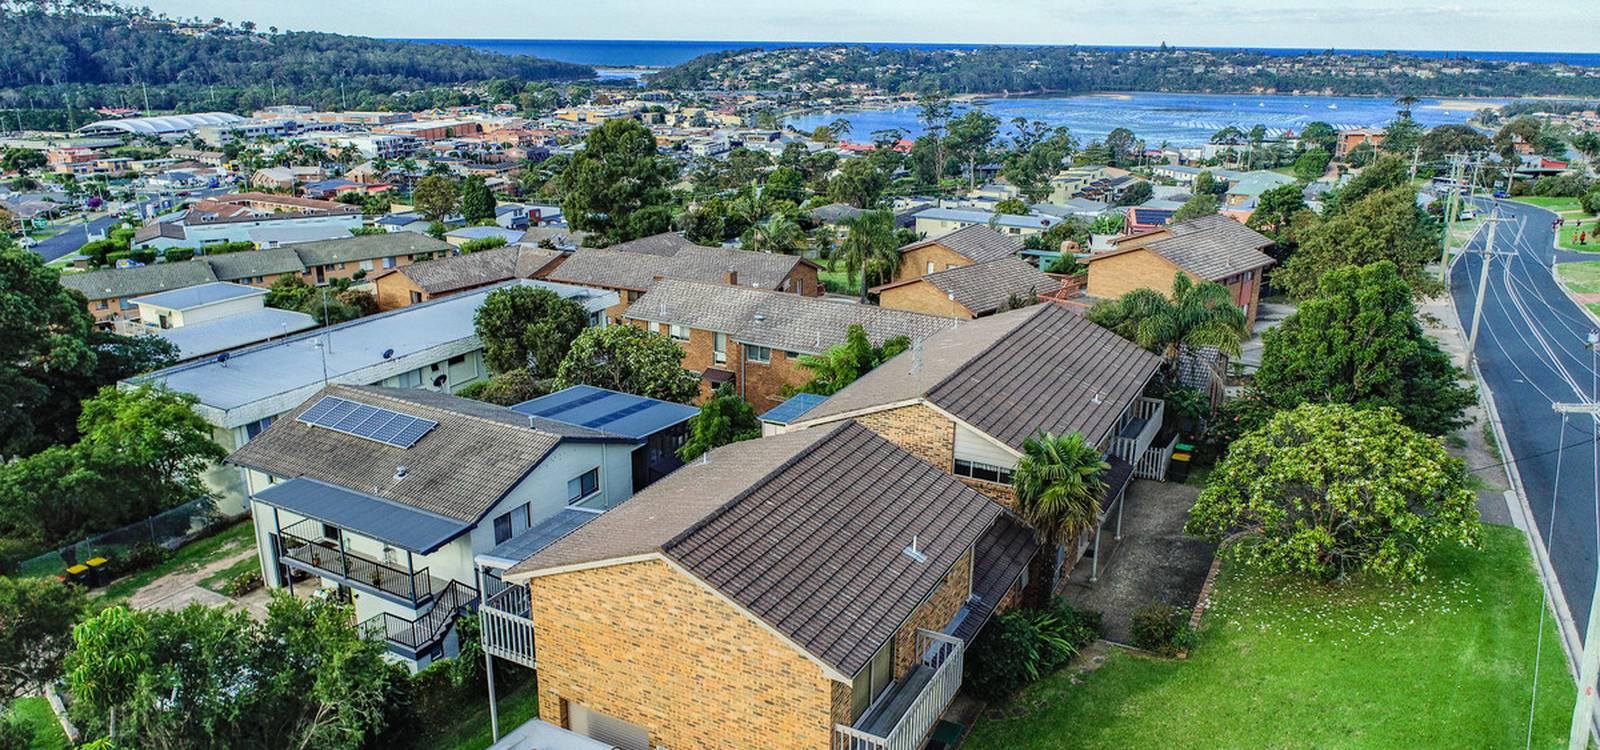 10 View Street MERIMBULA, NSW 2548 - photo 1